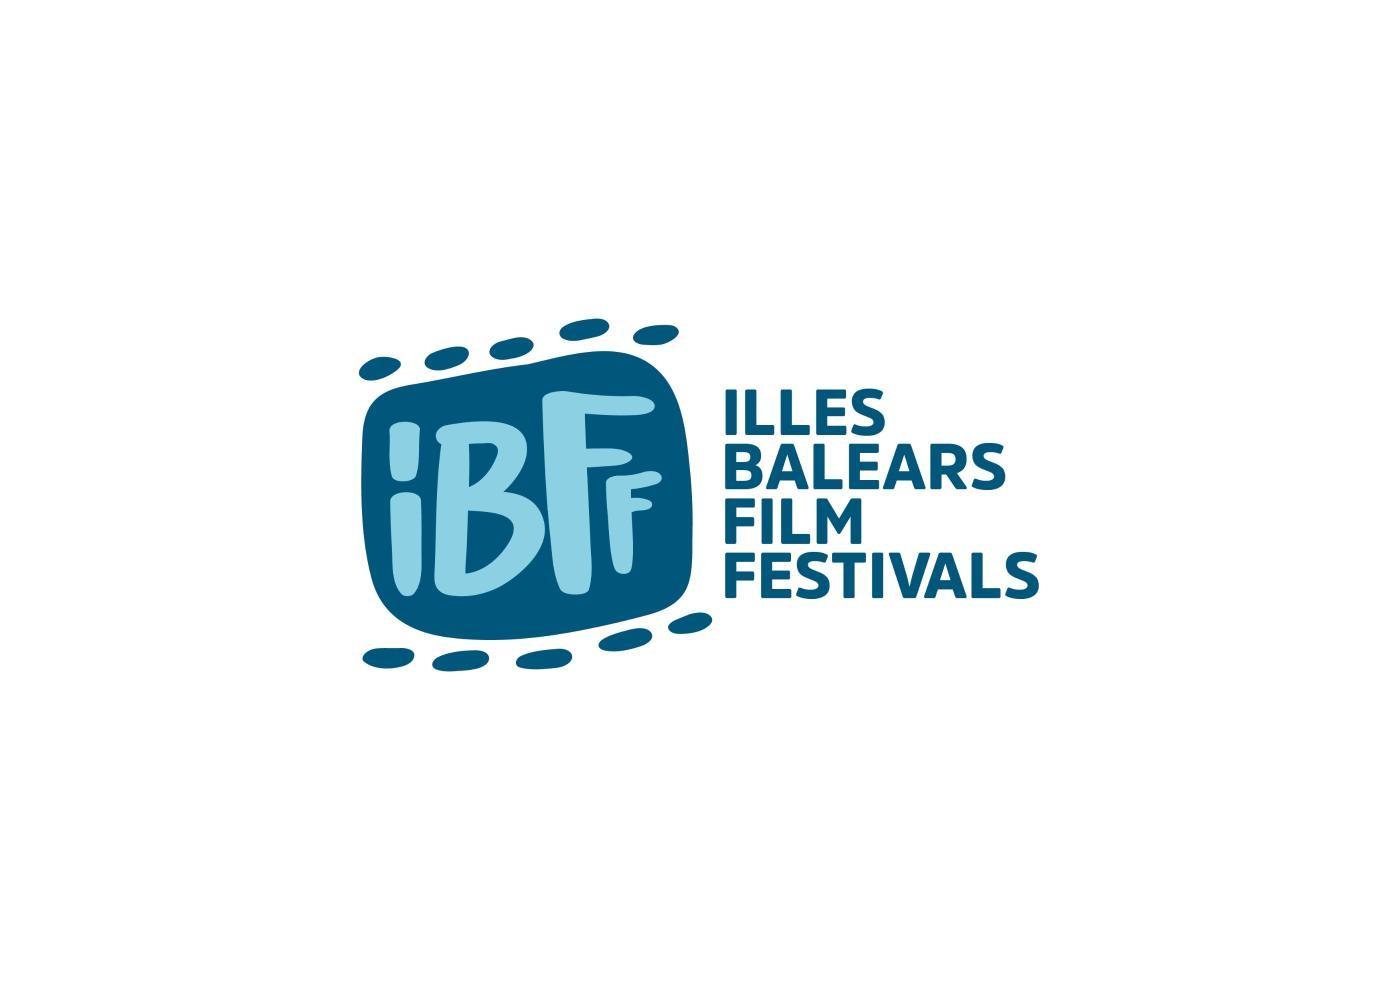 Logo-IBFF_positiu-color_1605633592466.jpg